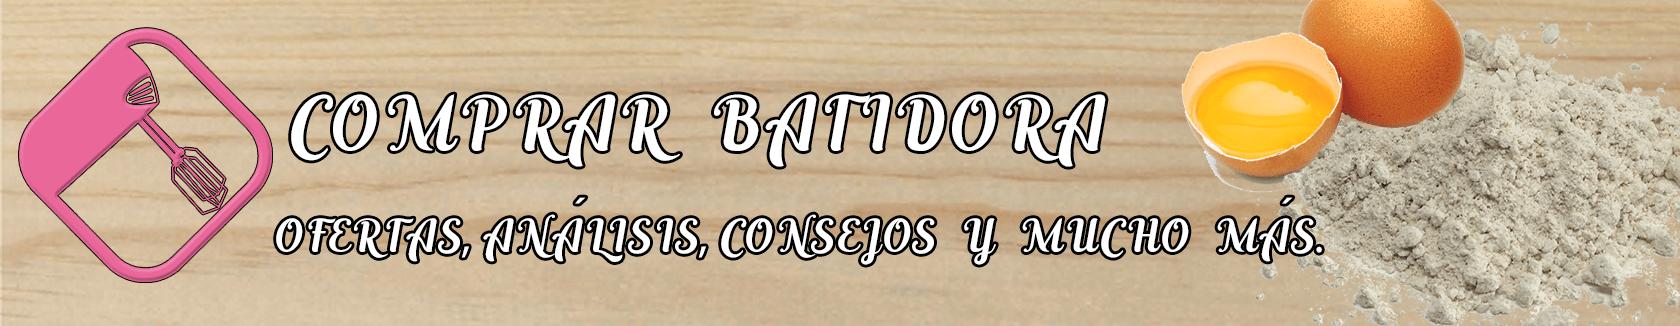 Comprar Batidora